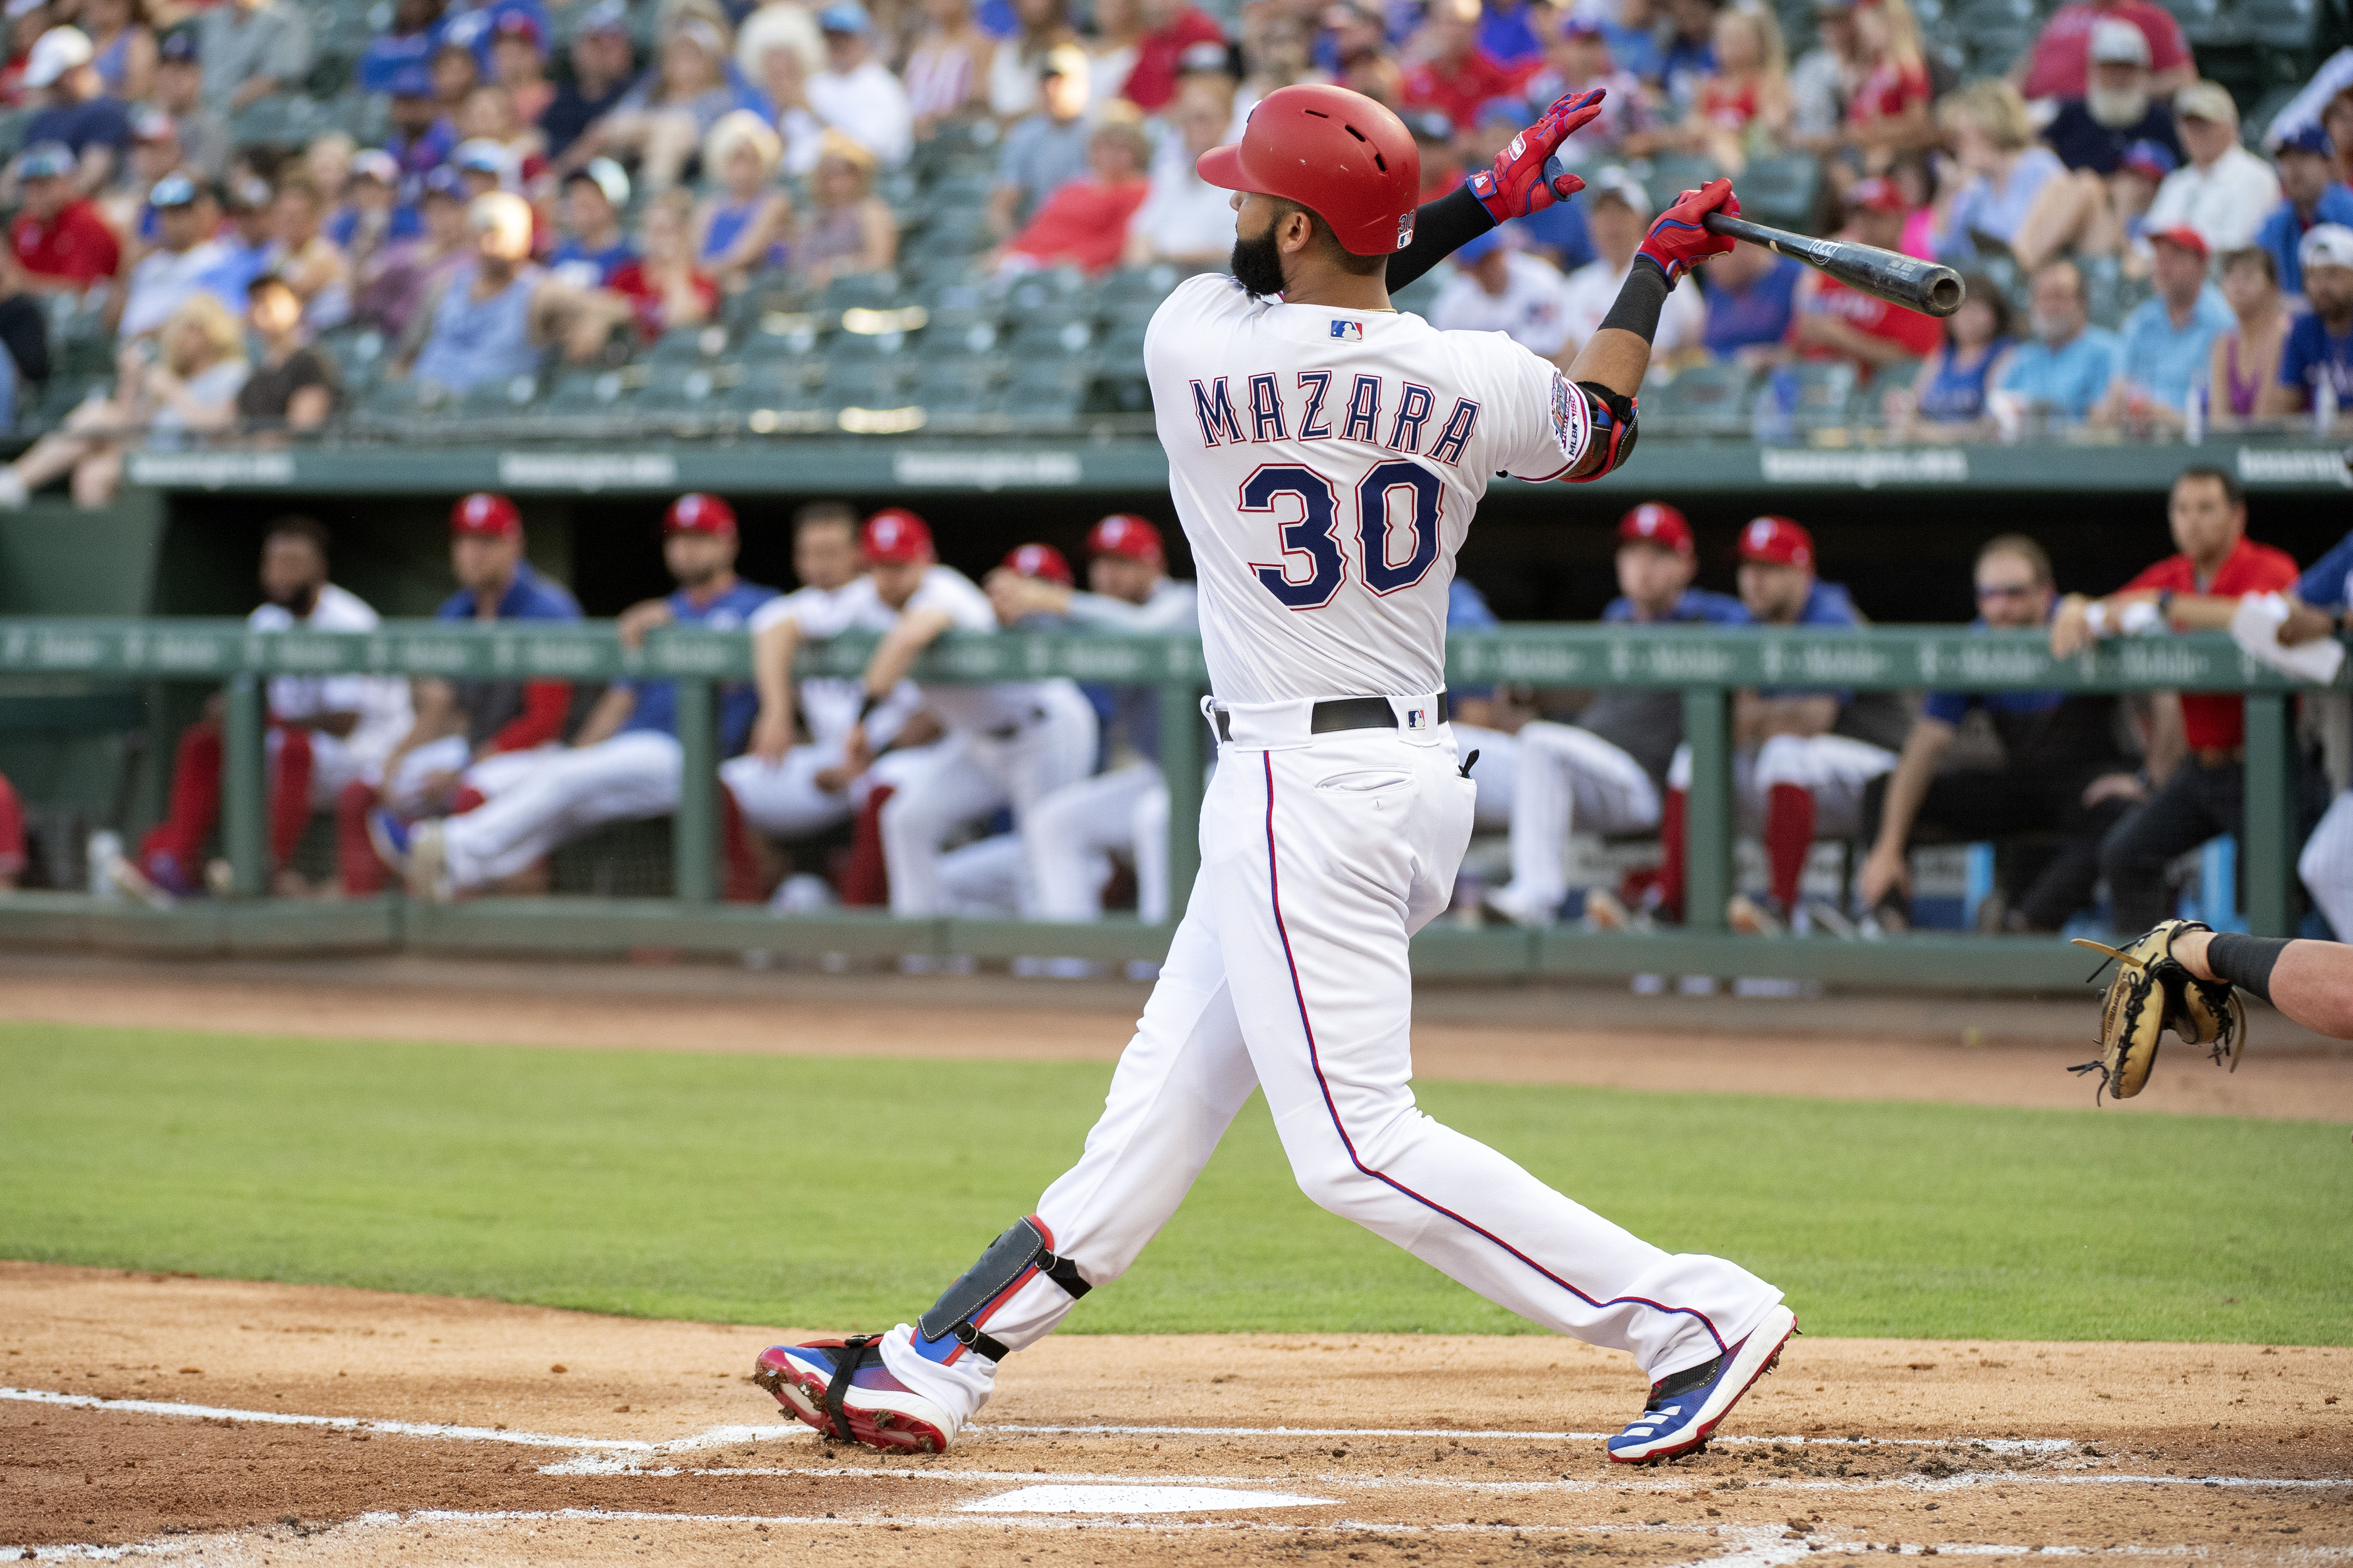 Nomar Mazara follows through on a 505-foot home run off White Sox starting pitcher Reynaldo Lopez on June 21, 2019, in Arlington, Texas. It was the longest homer in baseball last season. (AP)